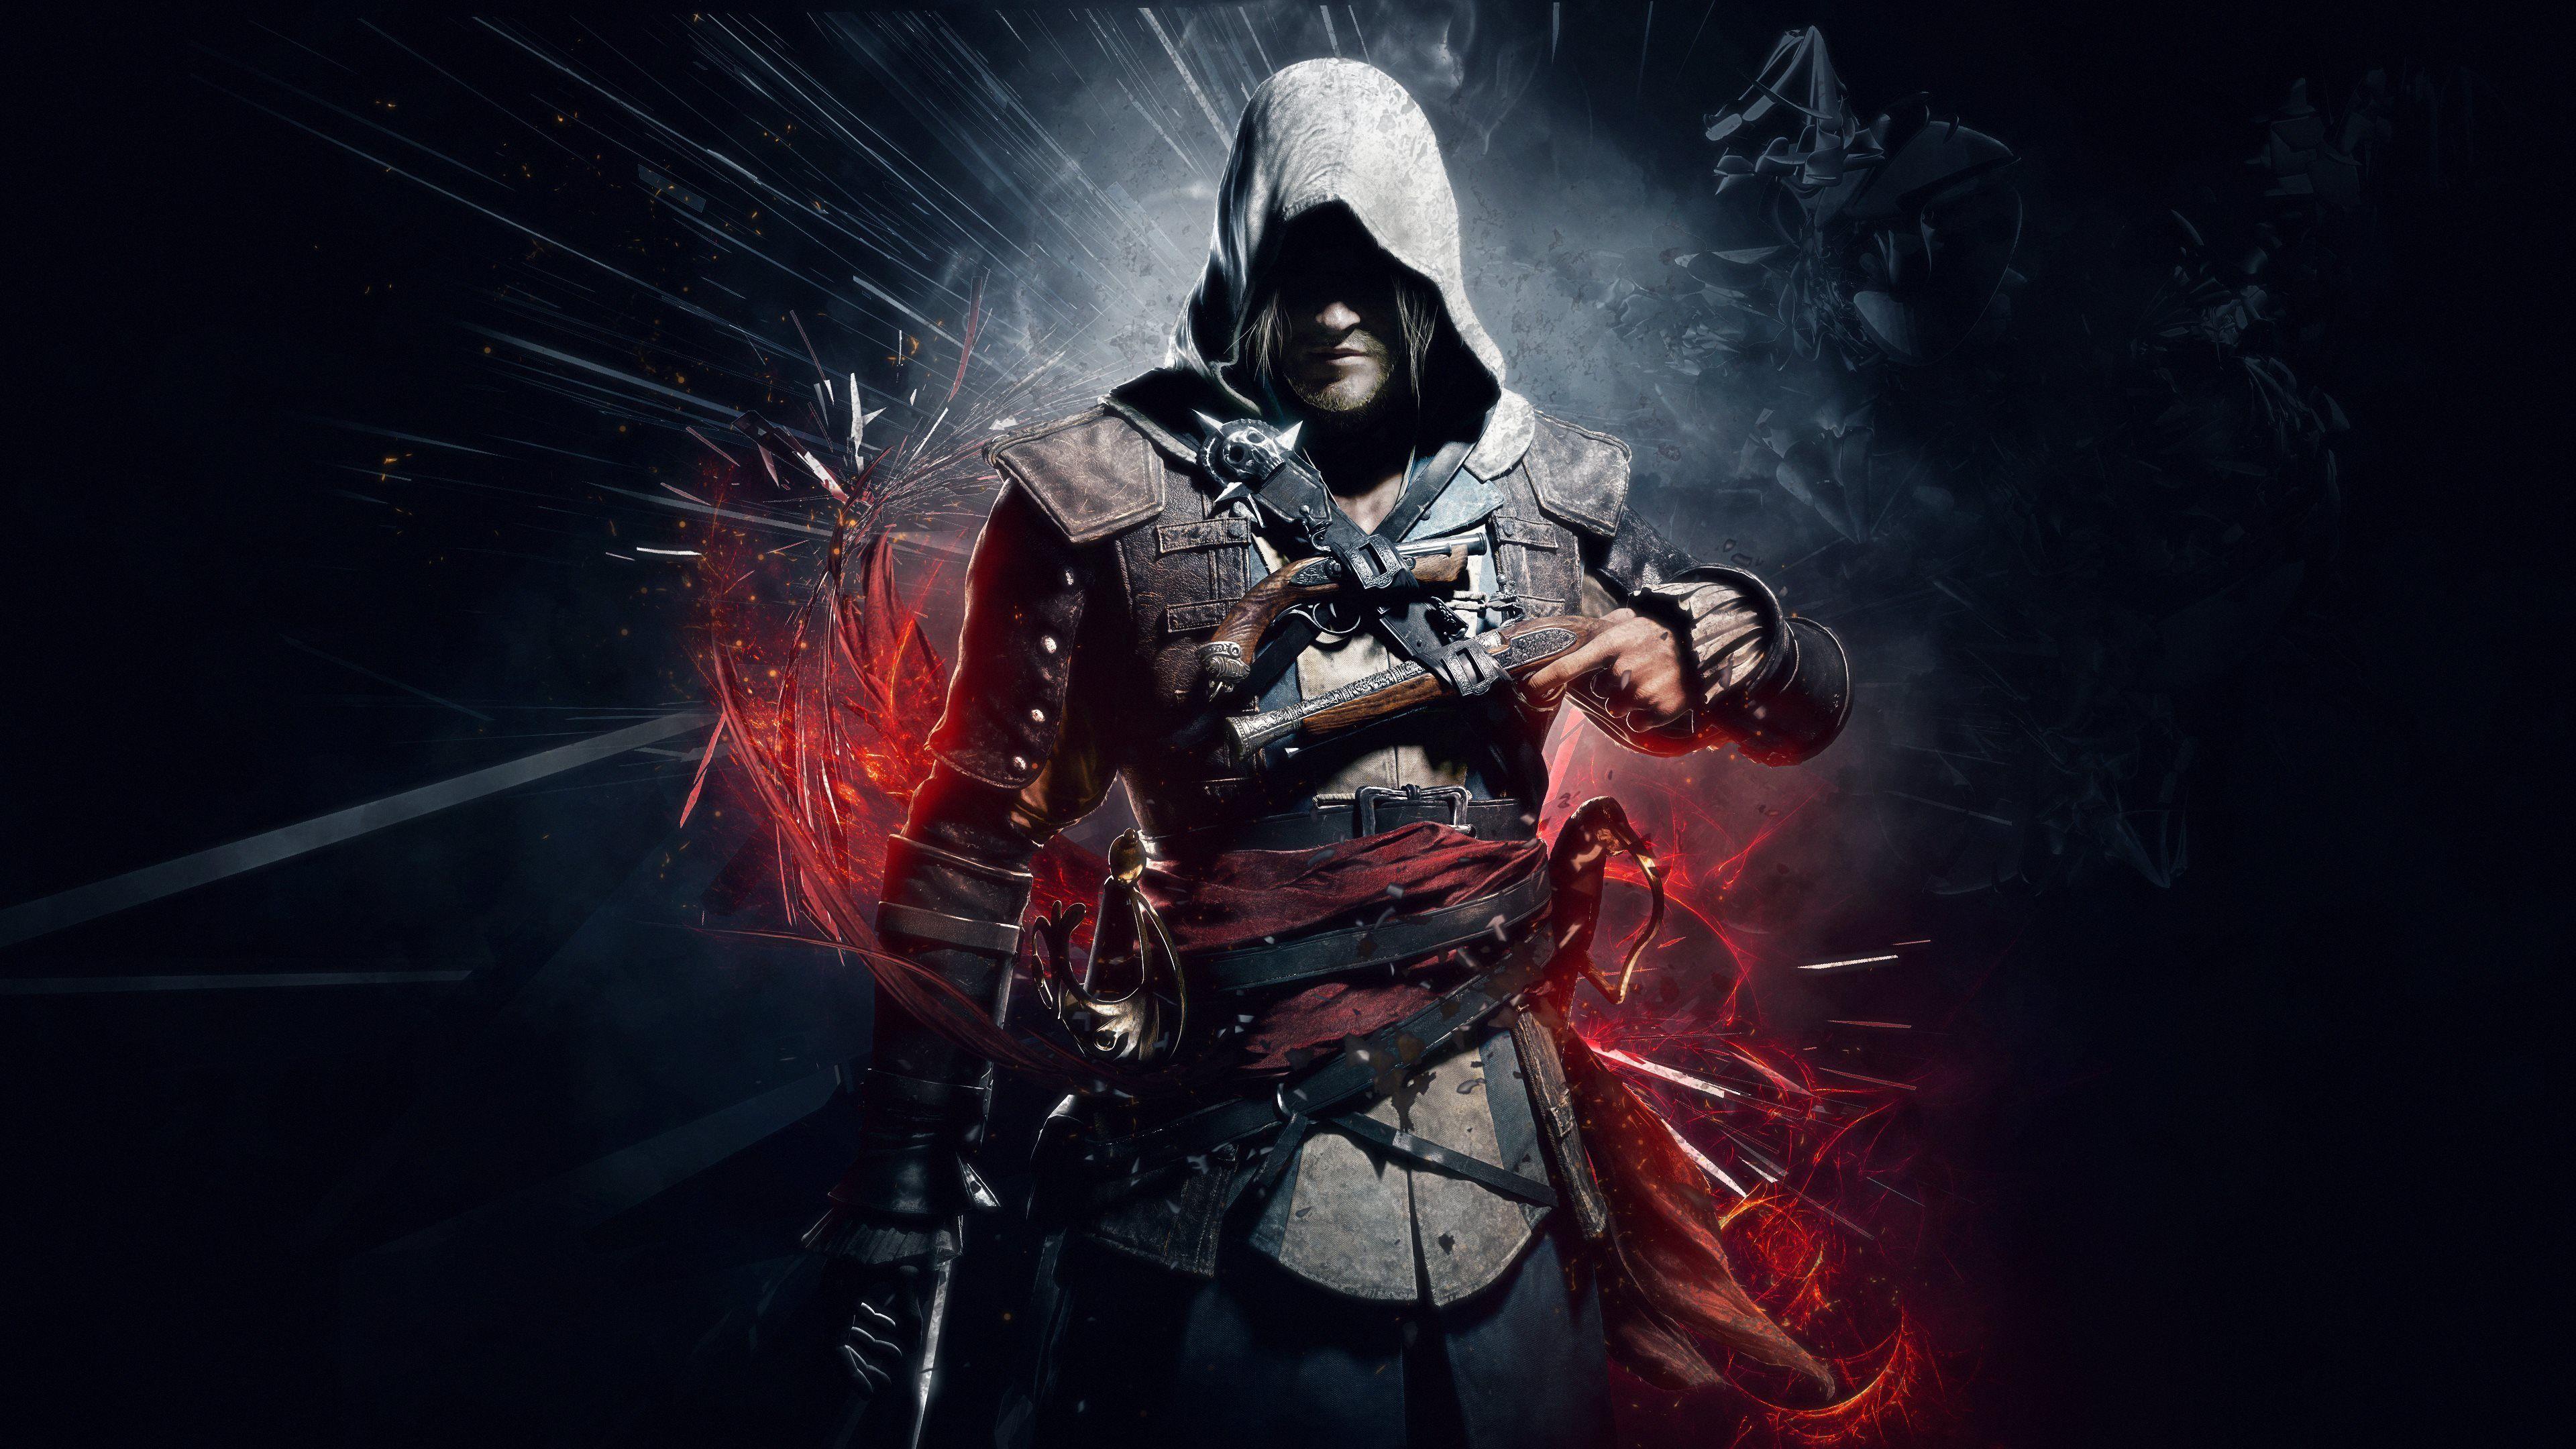 Assassin27screediv blackflagultrahdg 38402160 assassins creed iv black flag hd wallpaper voltagebd Choice Image